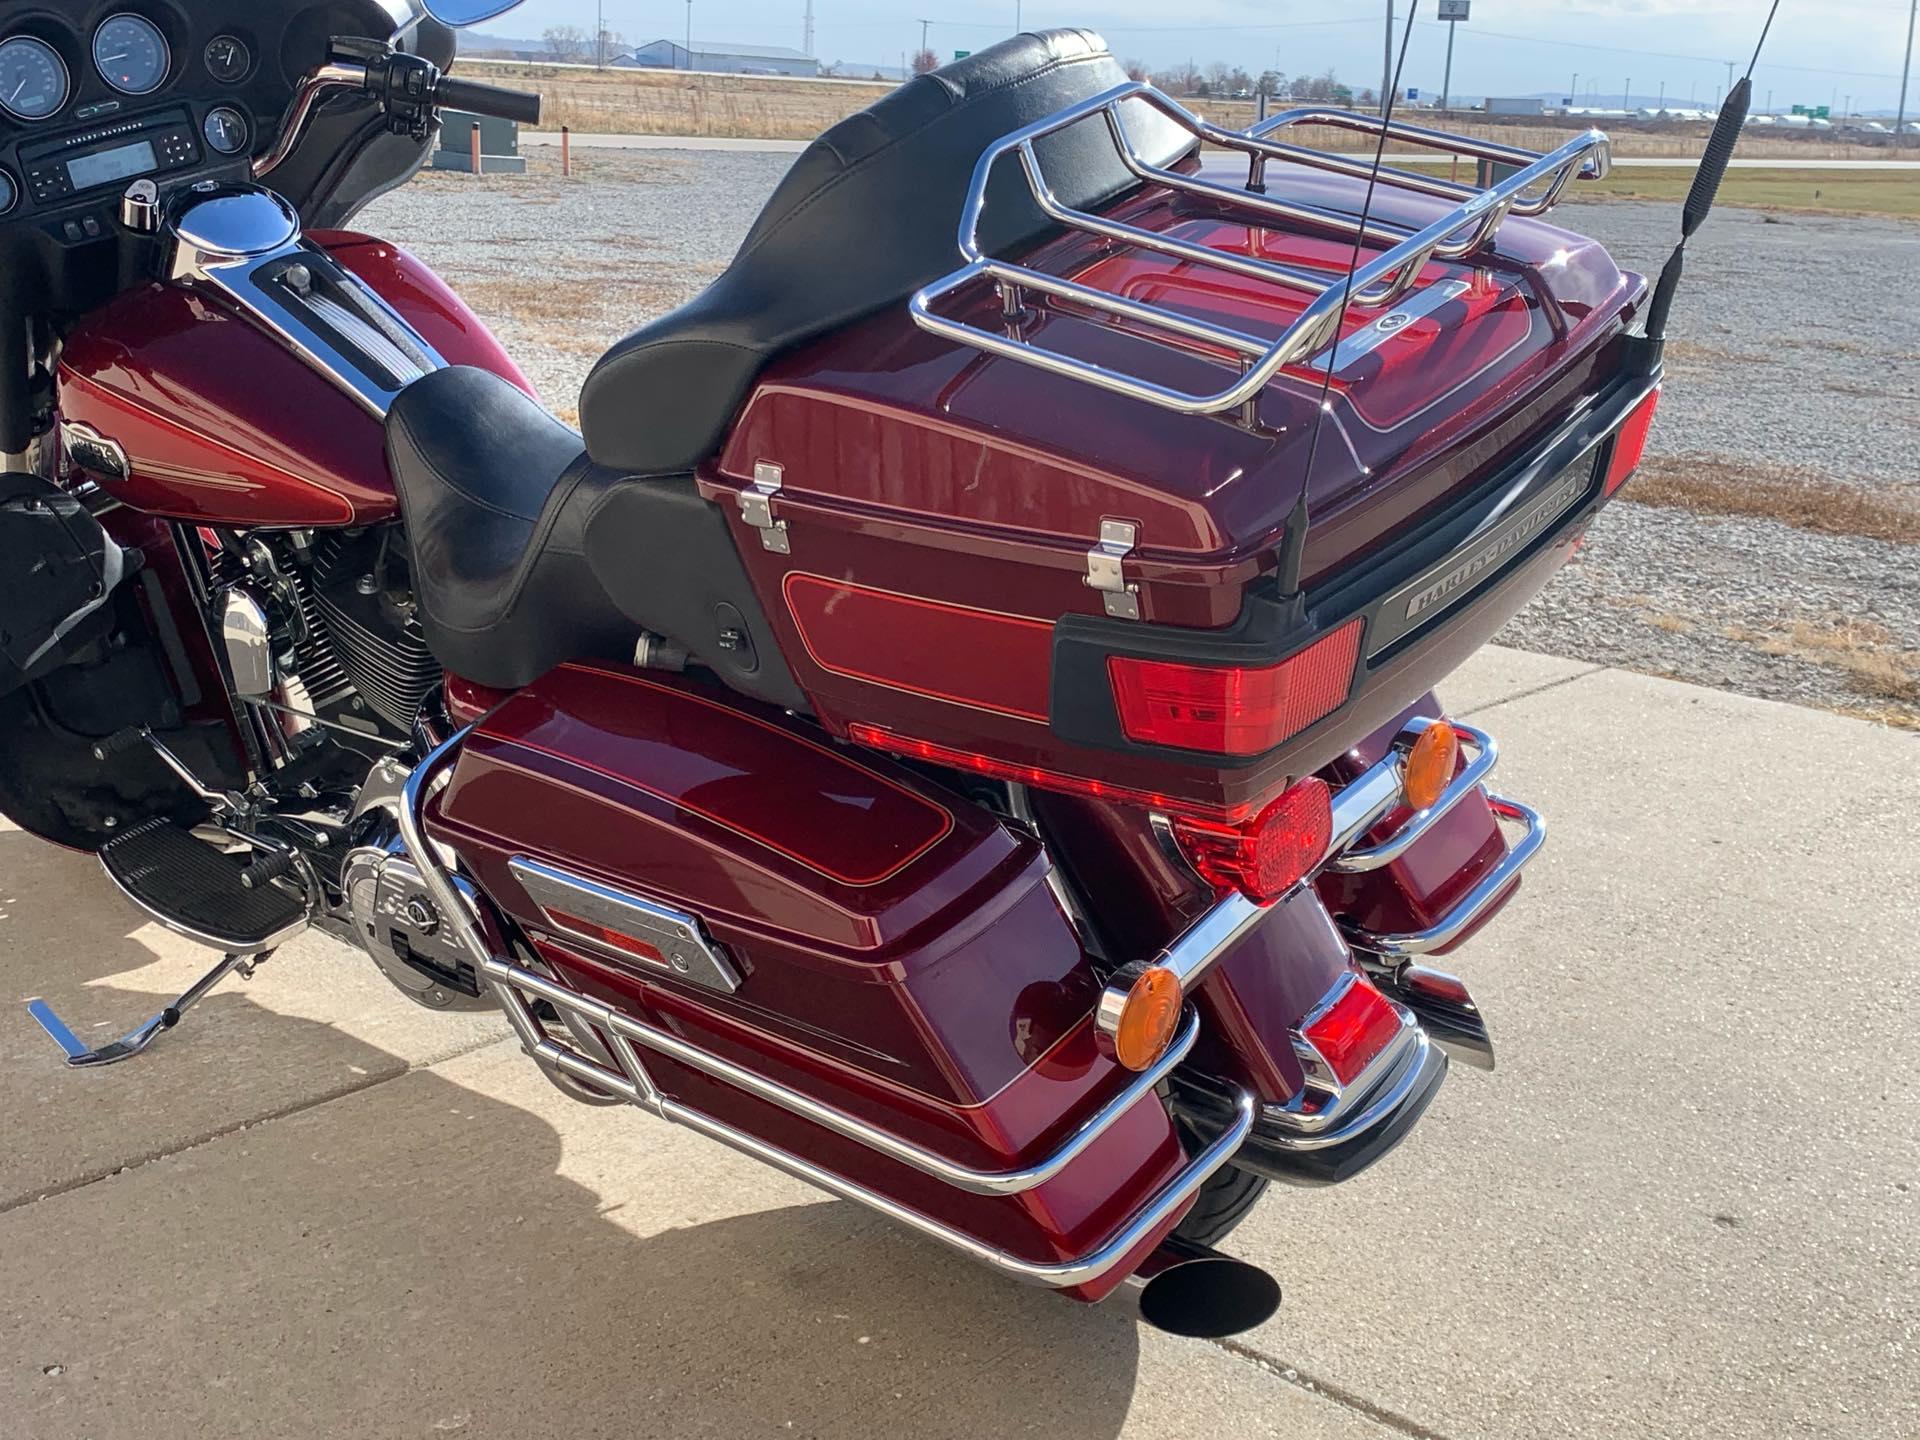 2008 Harley-Davidson Electra Glide Ultra Classic at Loess Hills Harley-Davidson